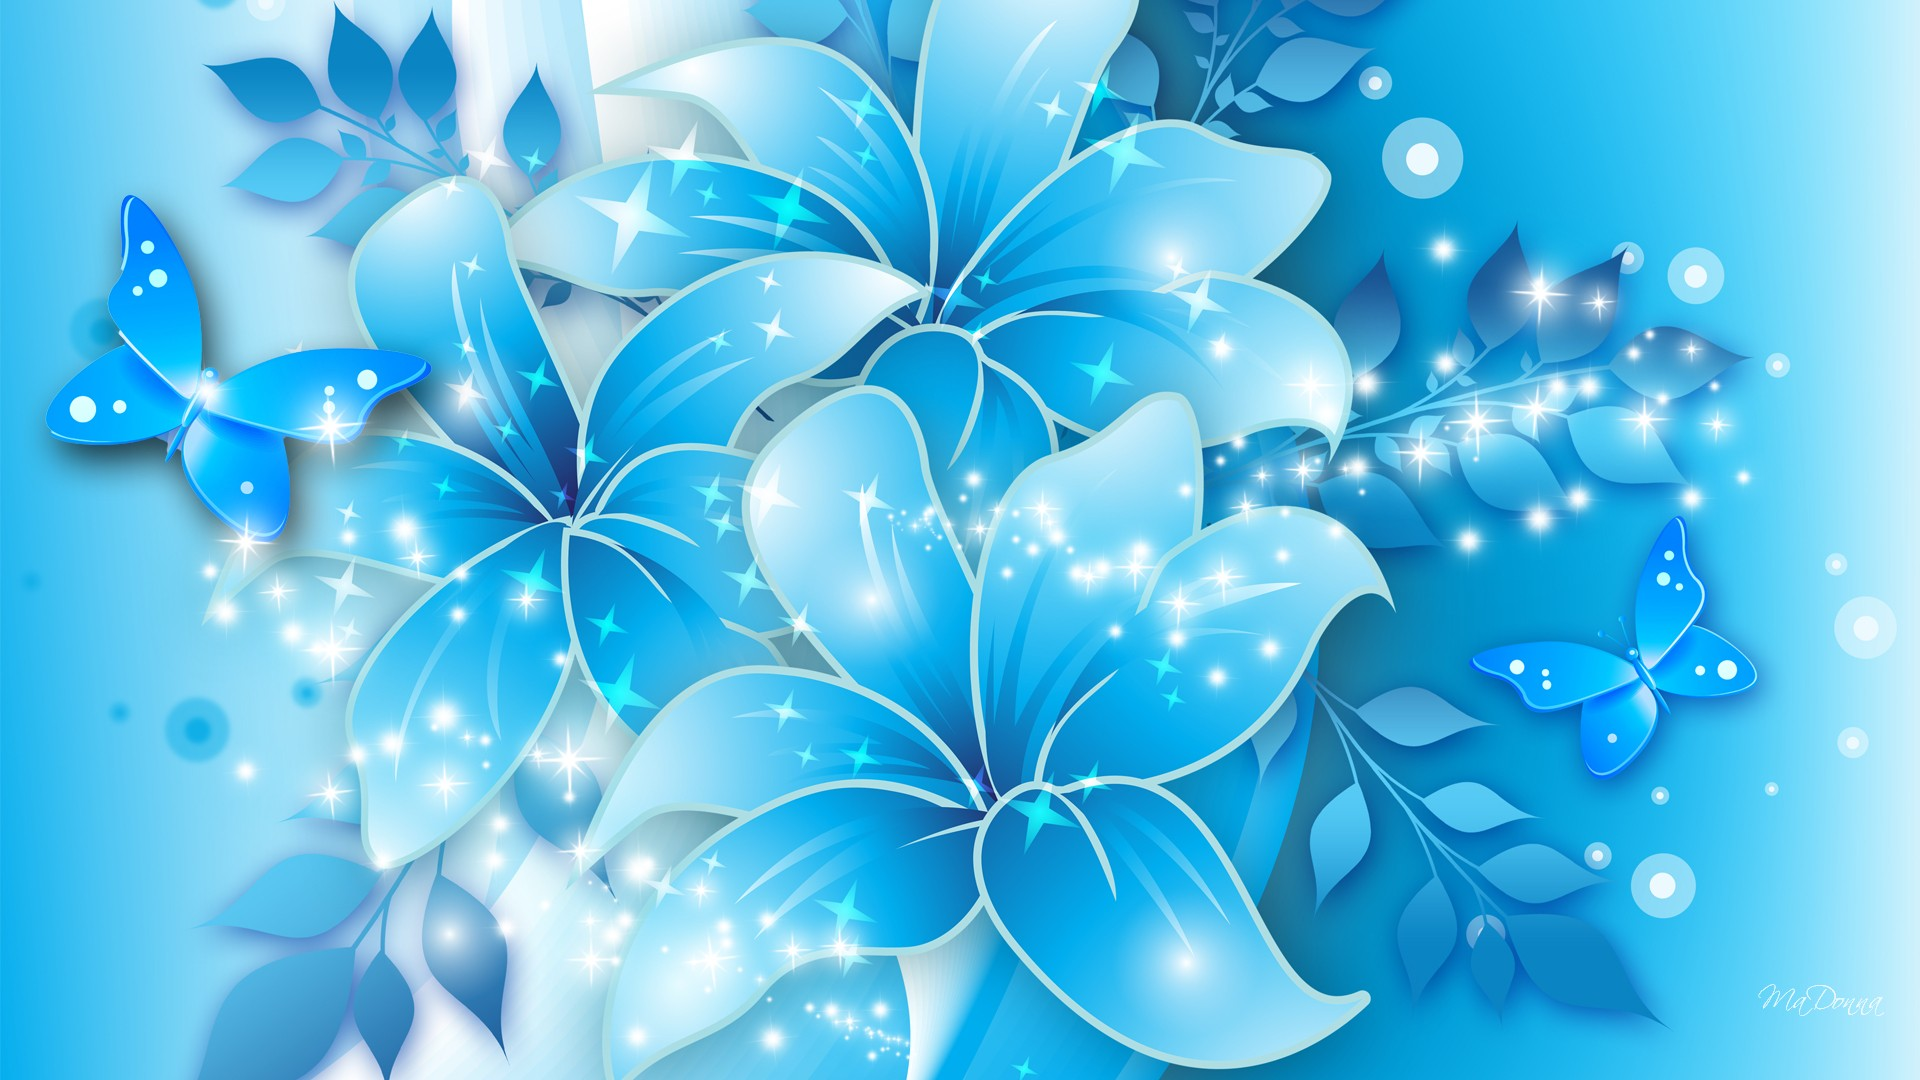 beautiful blue flowers background 1920x1080 1920x1080